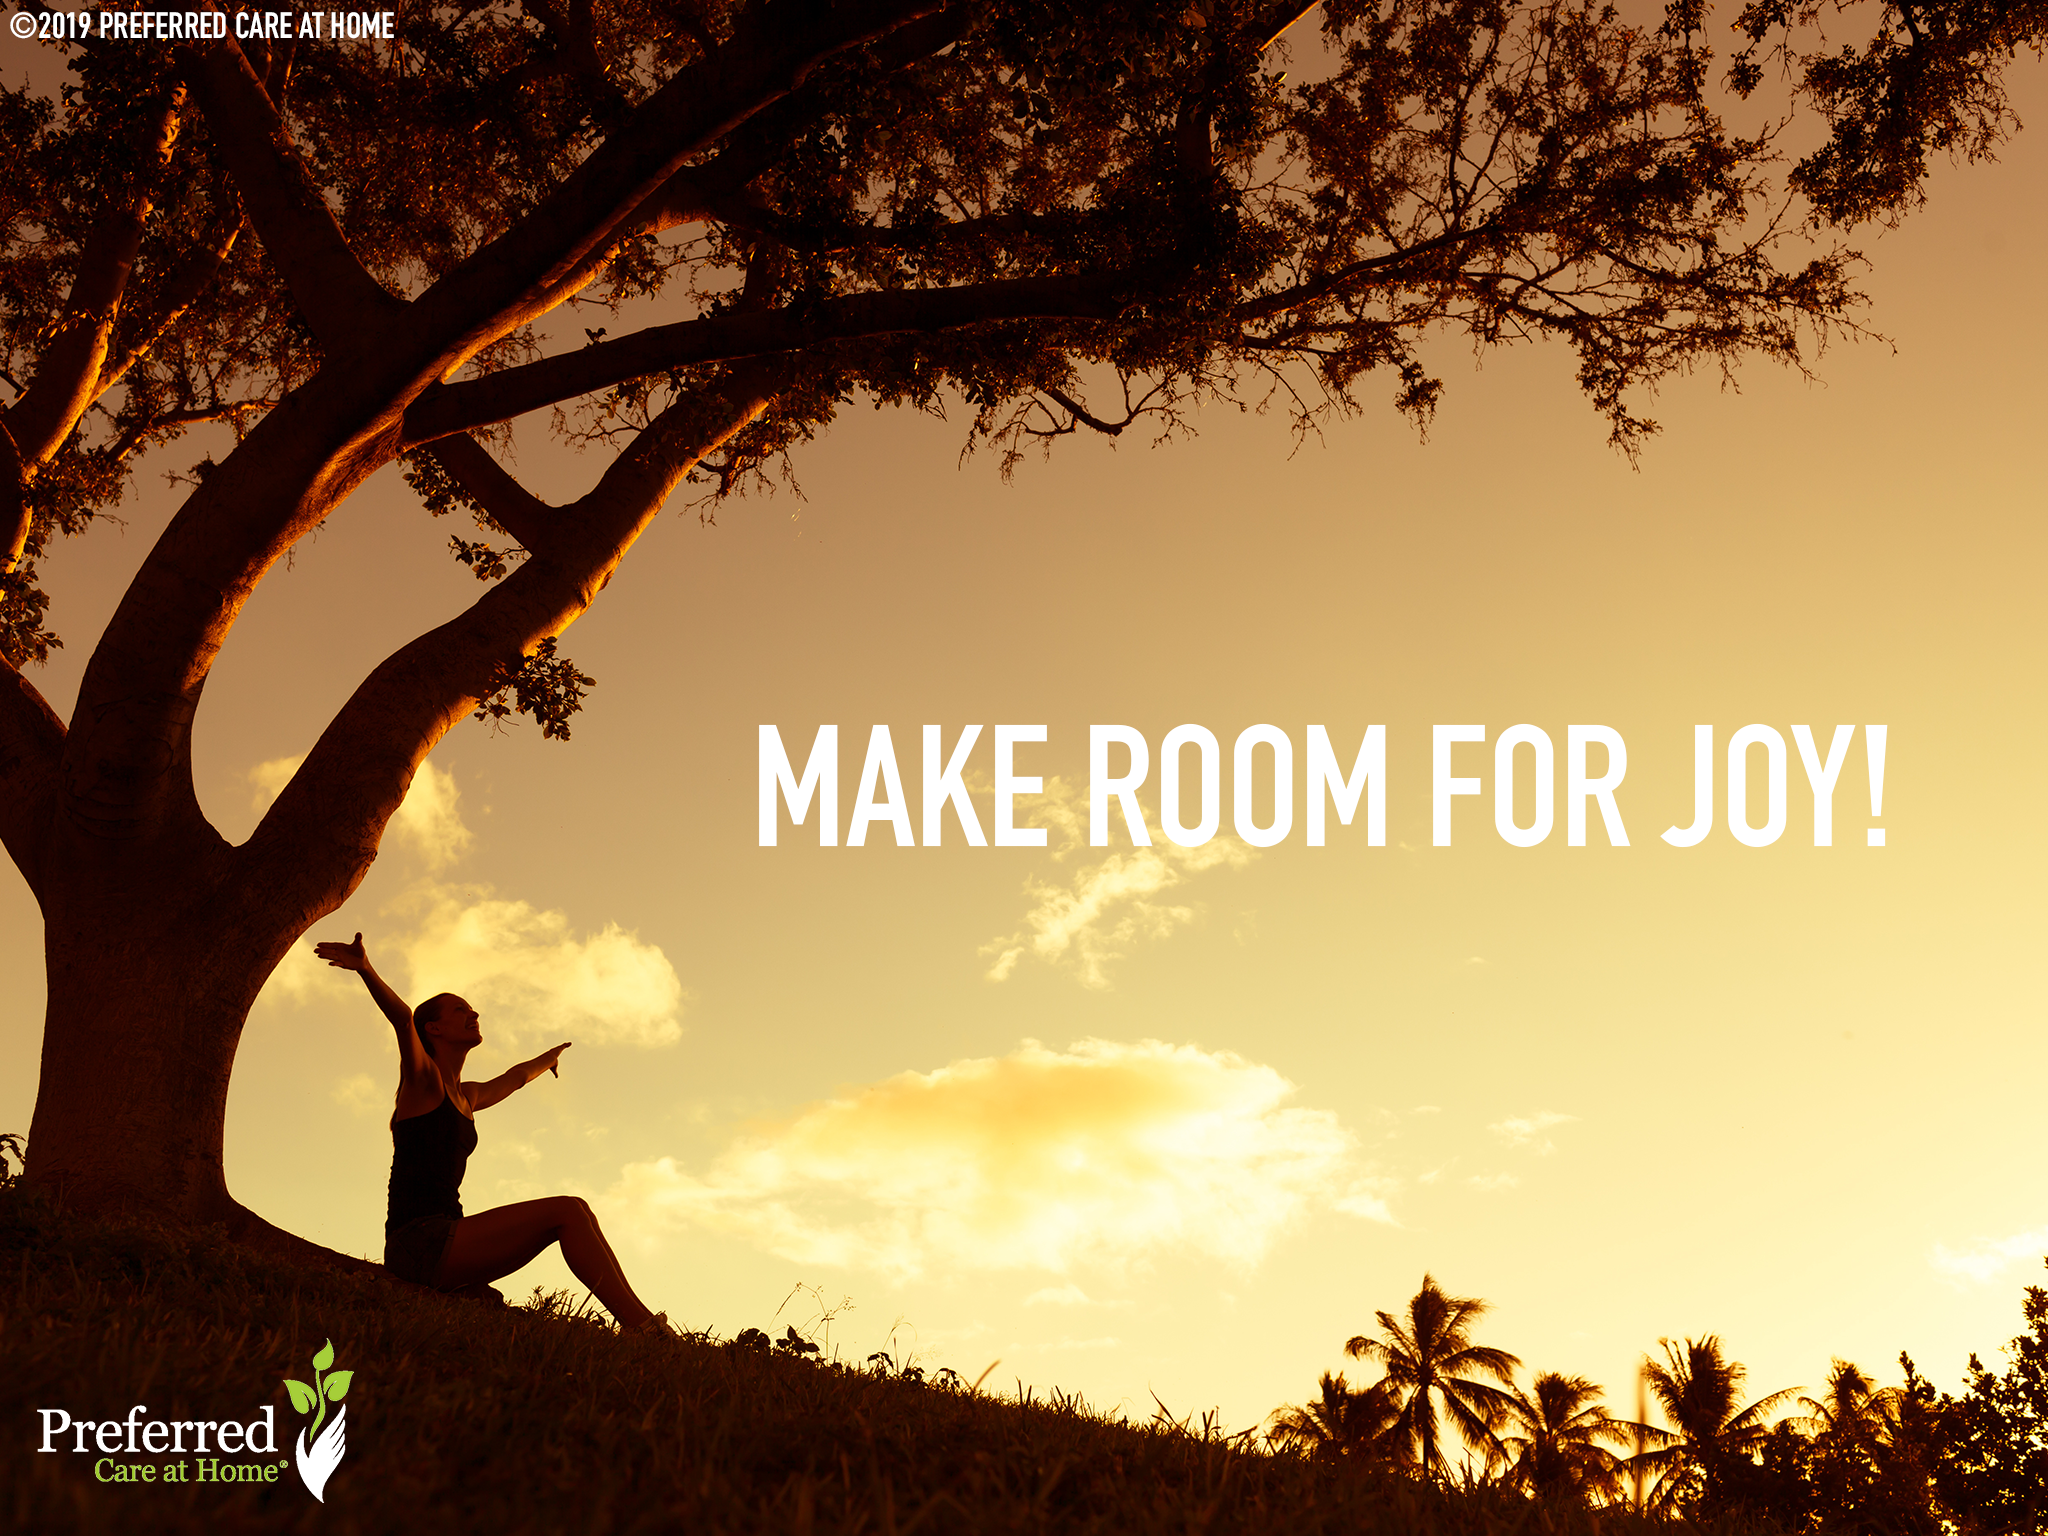 Make Room for Joy!